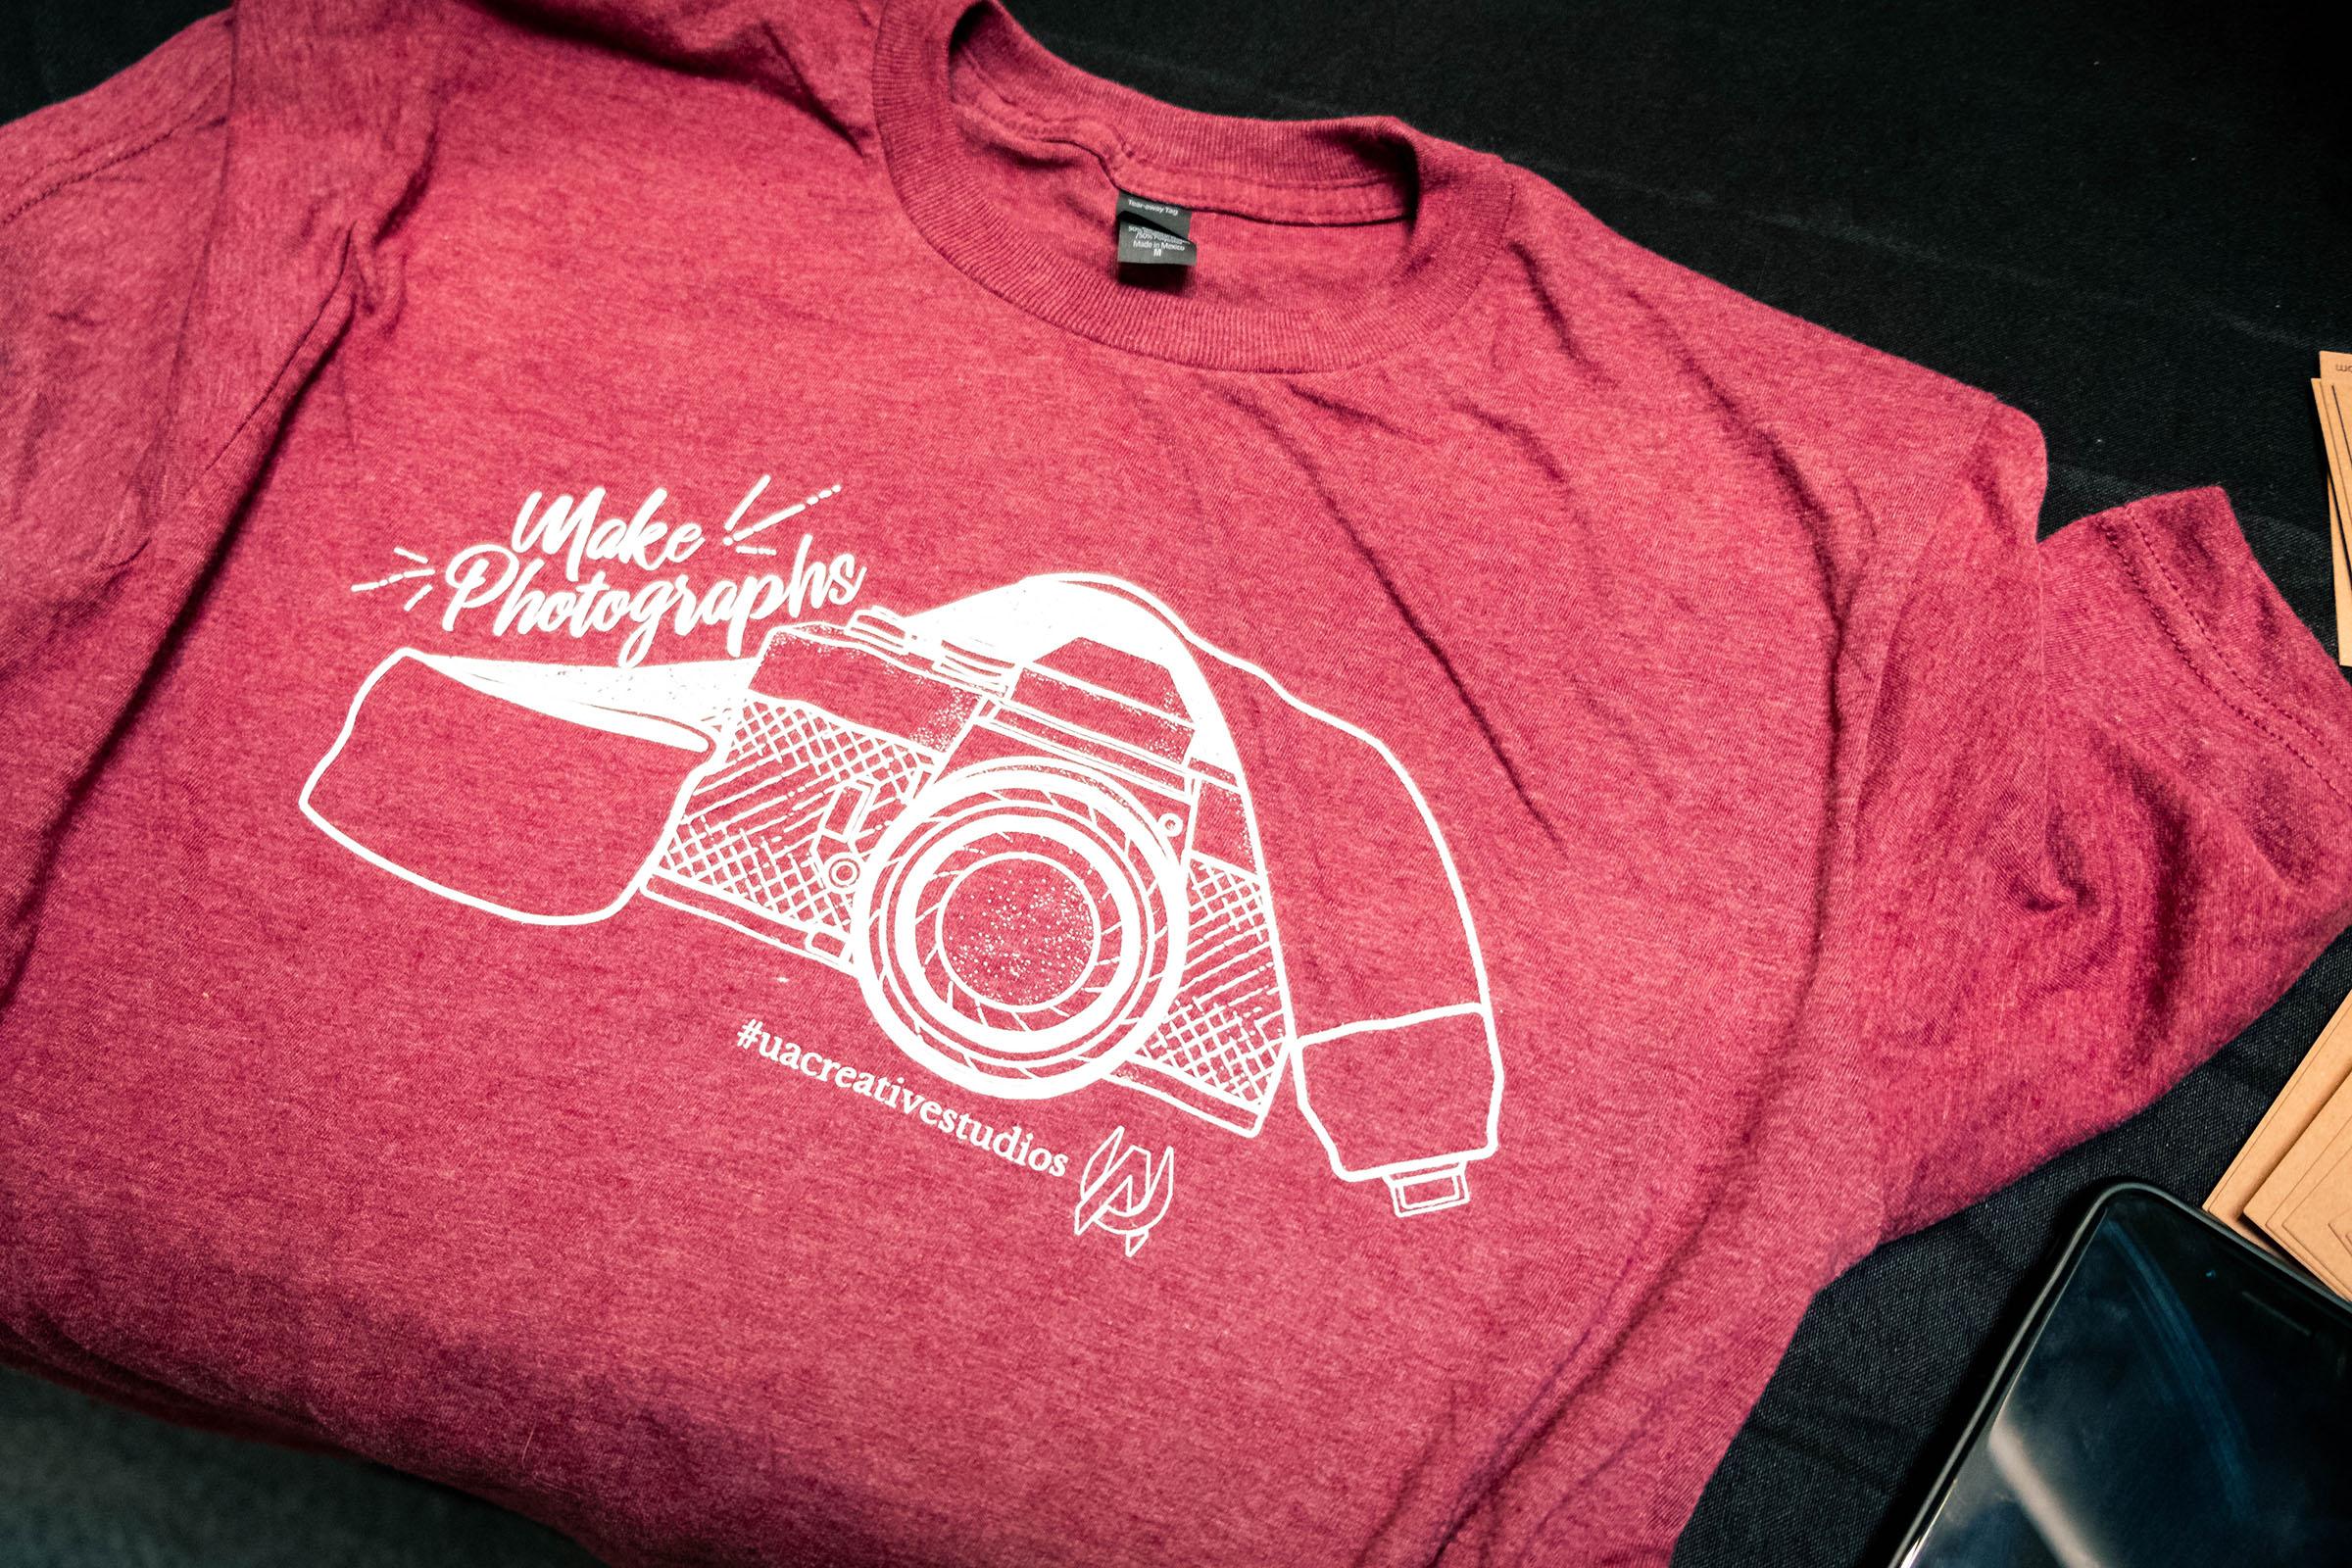 camera recycling event tee shirt